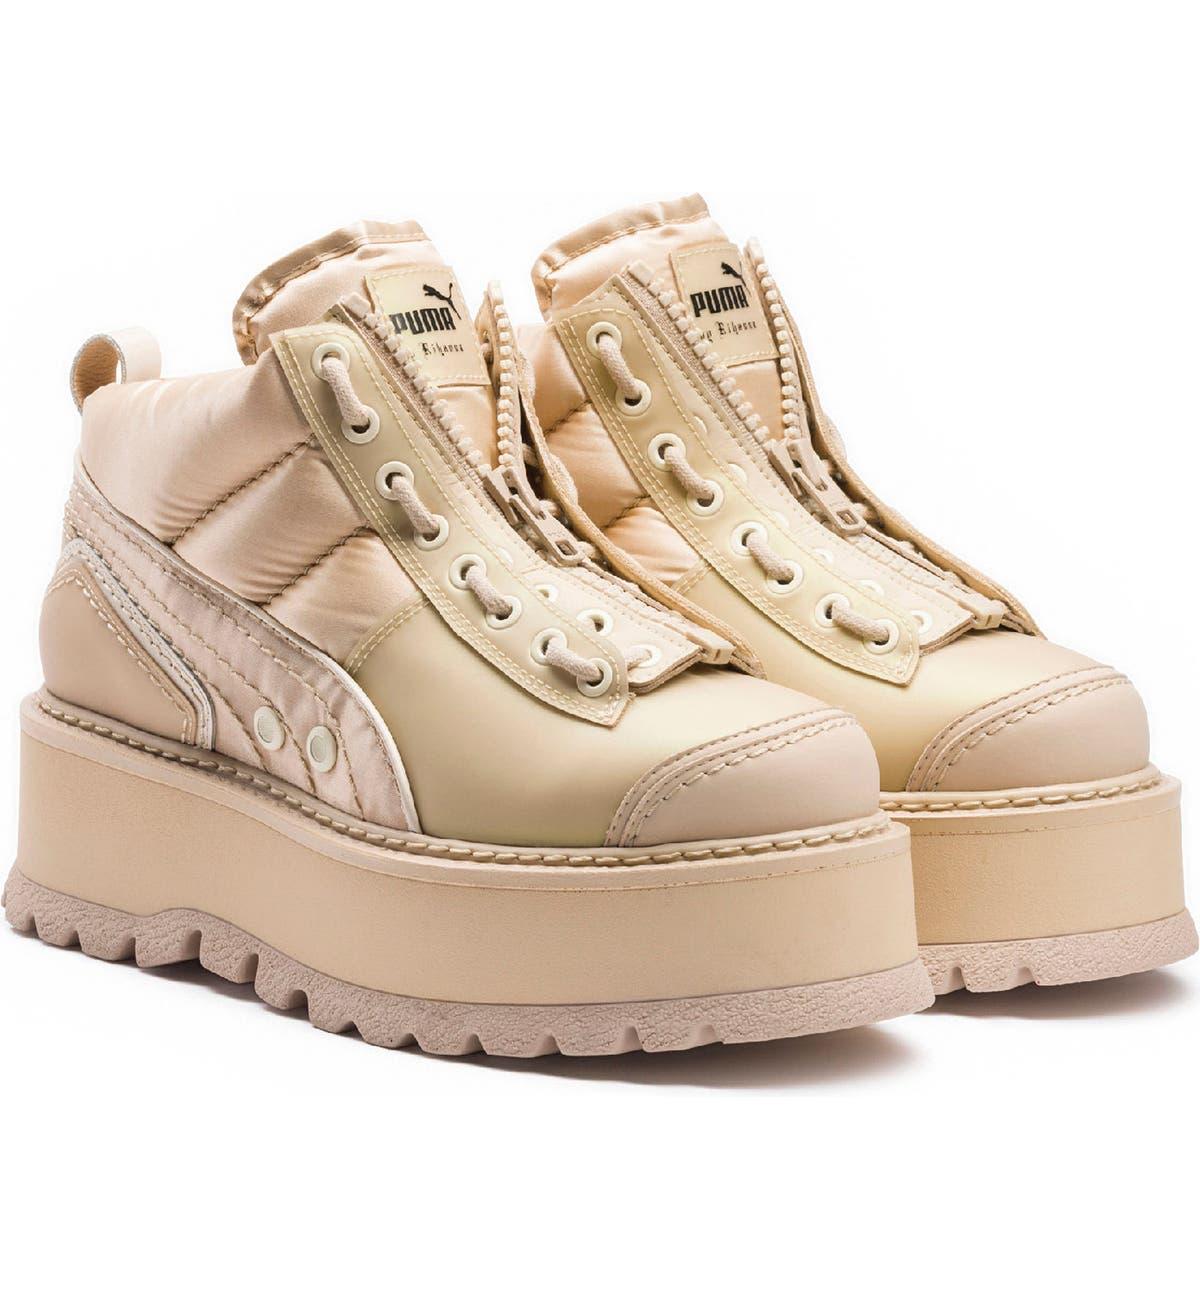 finest selection b8027 4574e FENTY PUMA by Rihanna Platform Sneaker Boot (Women)   Nordstrom